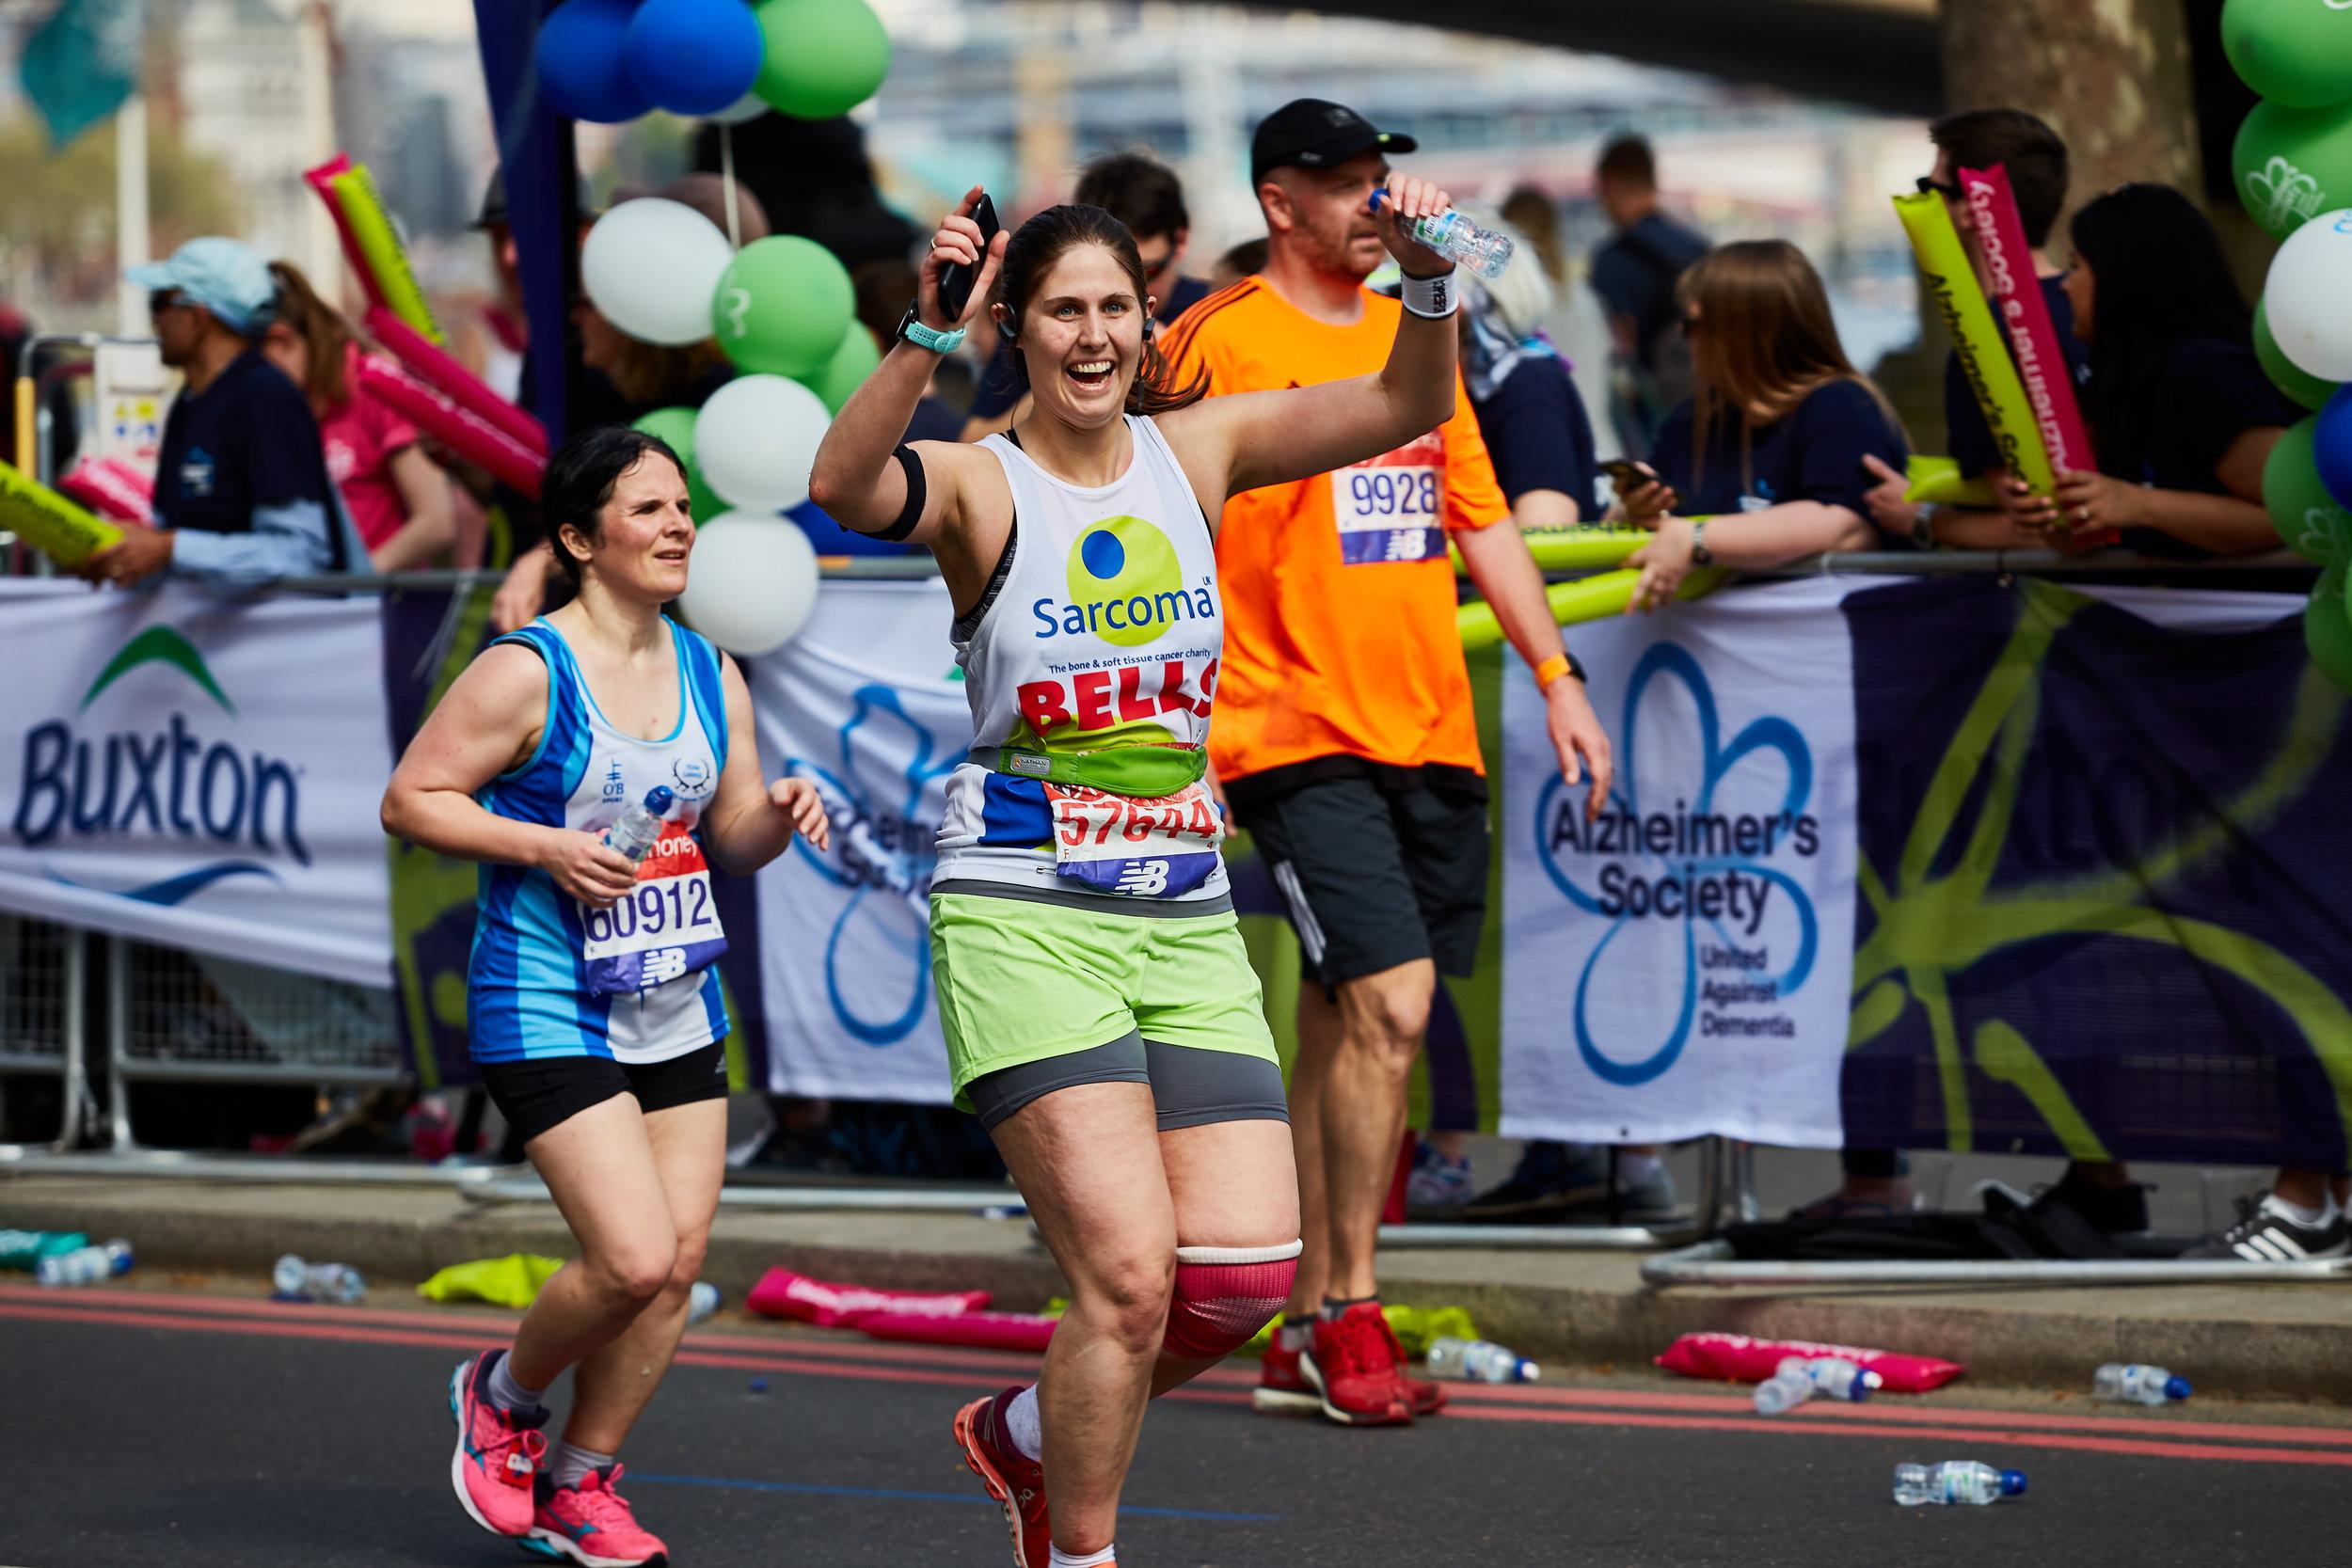 sarcoma_marathon2018_IMG_9187.jpg